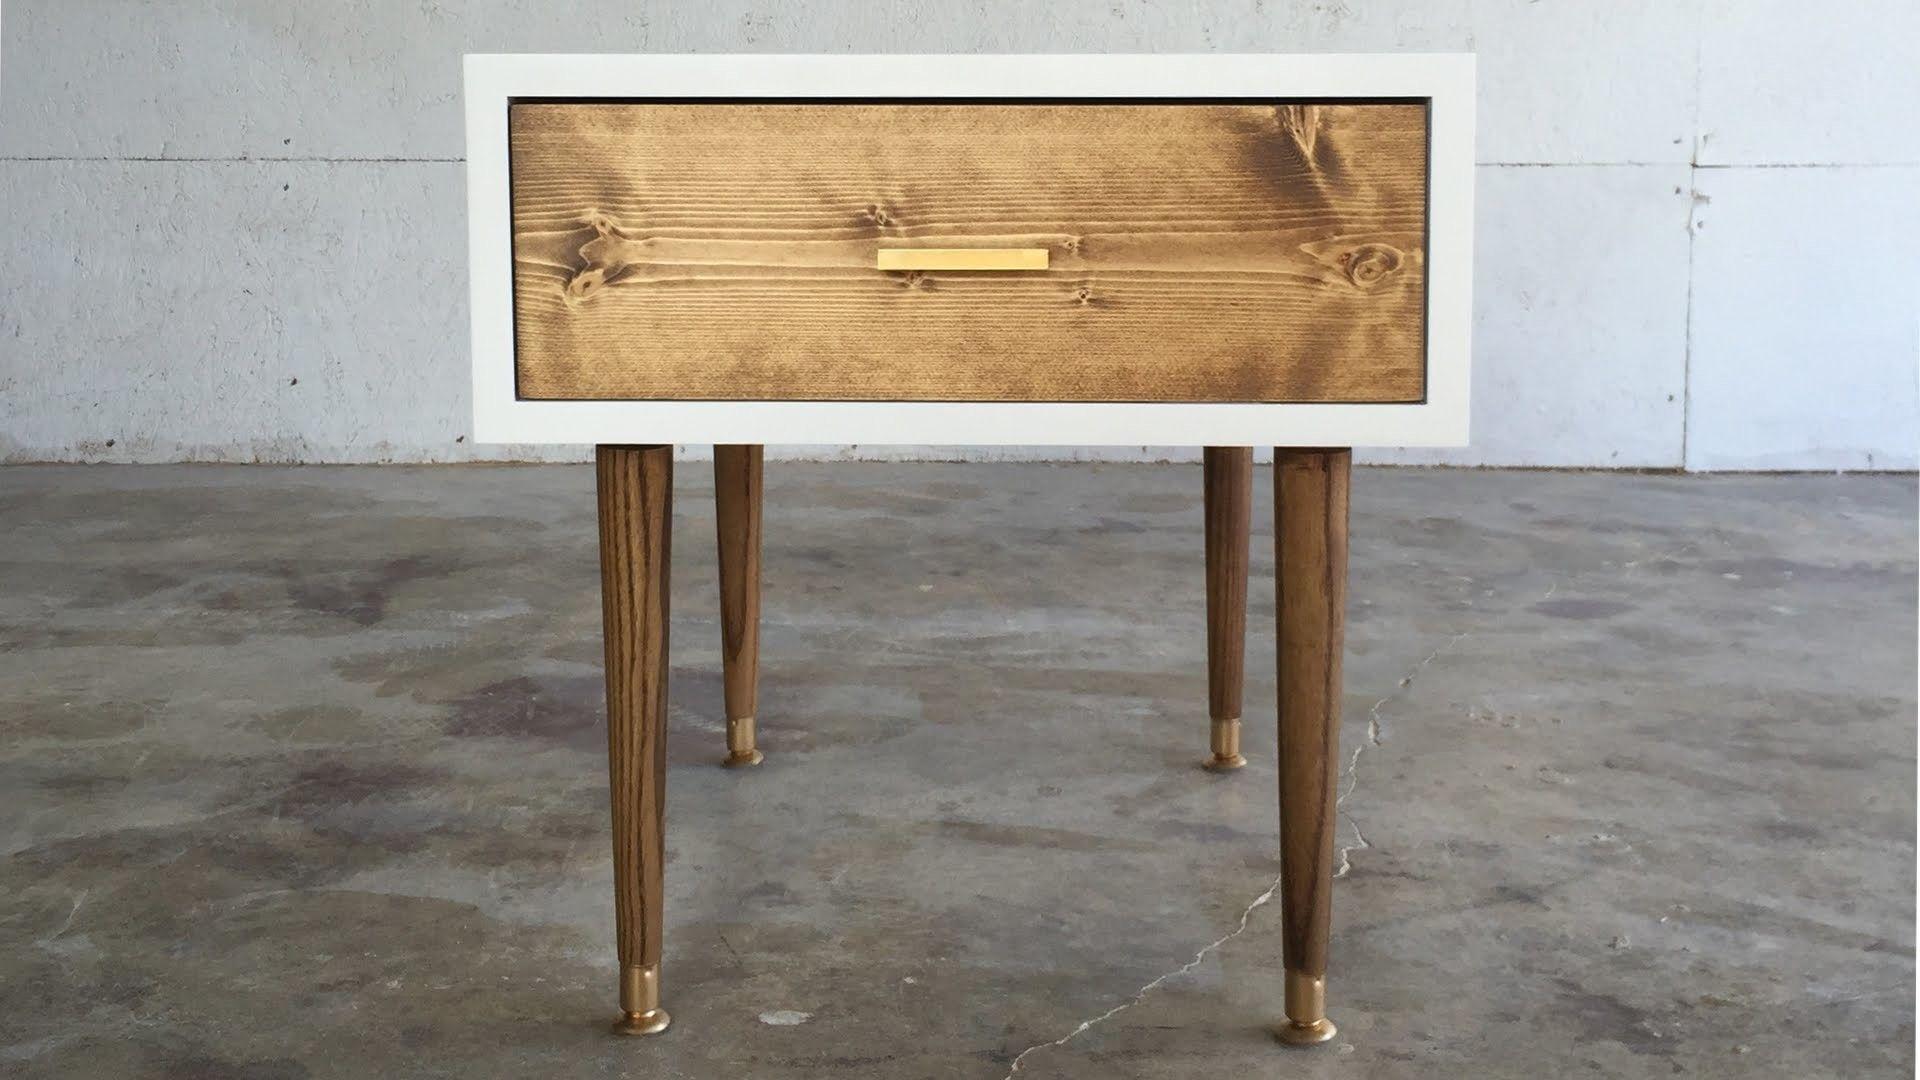 DIY MID CENTURY MODERN END TABLE